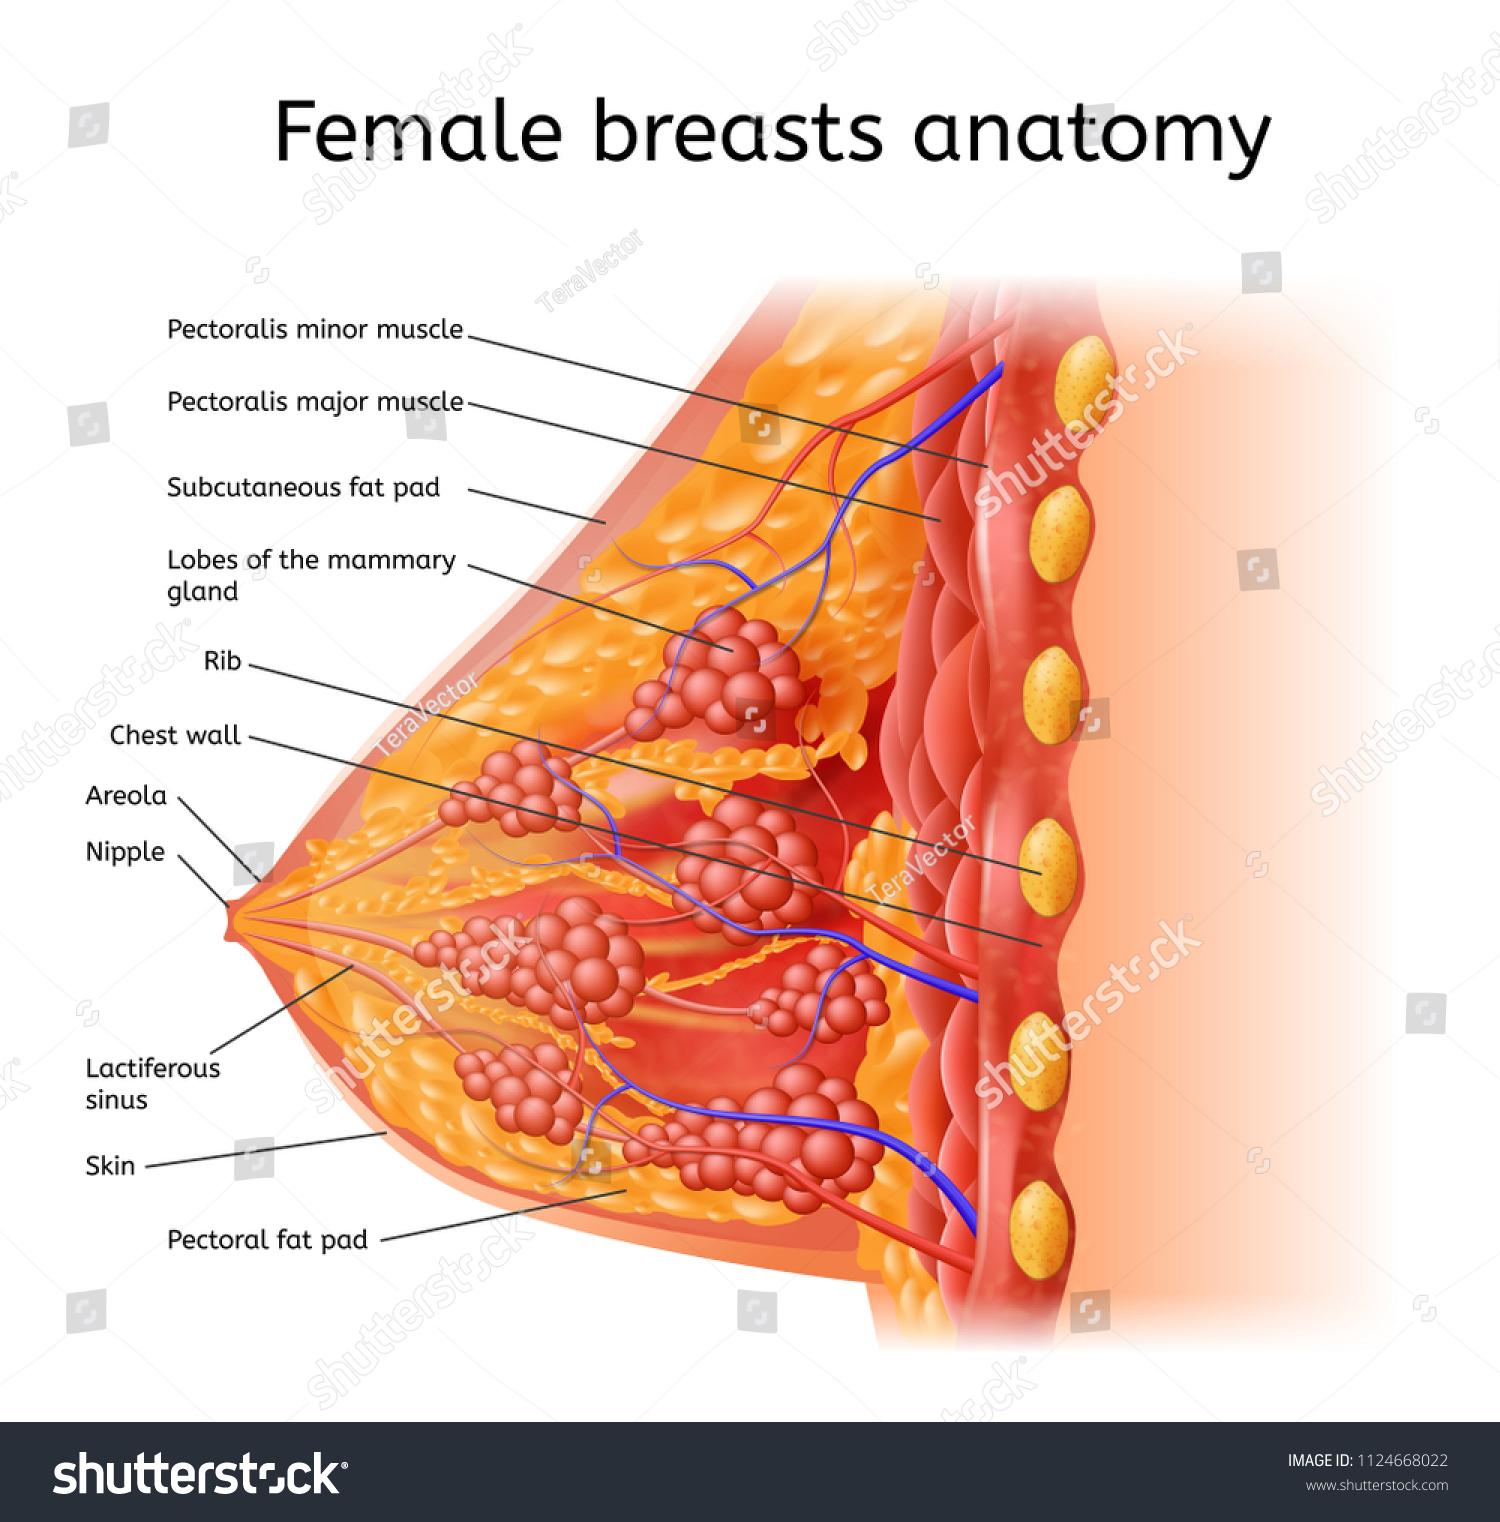 Human Female Breast Anatomy Detailed Vector Stock Vector 1124668022 ...